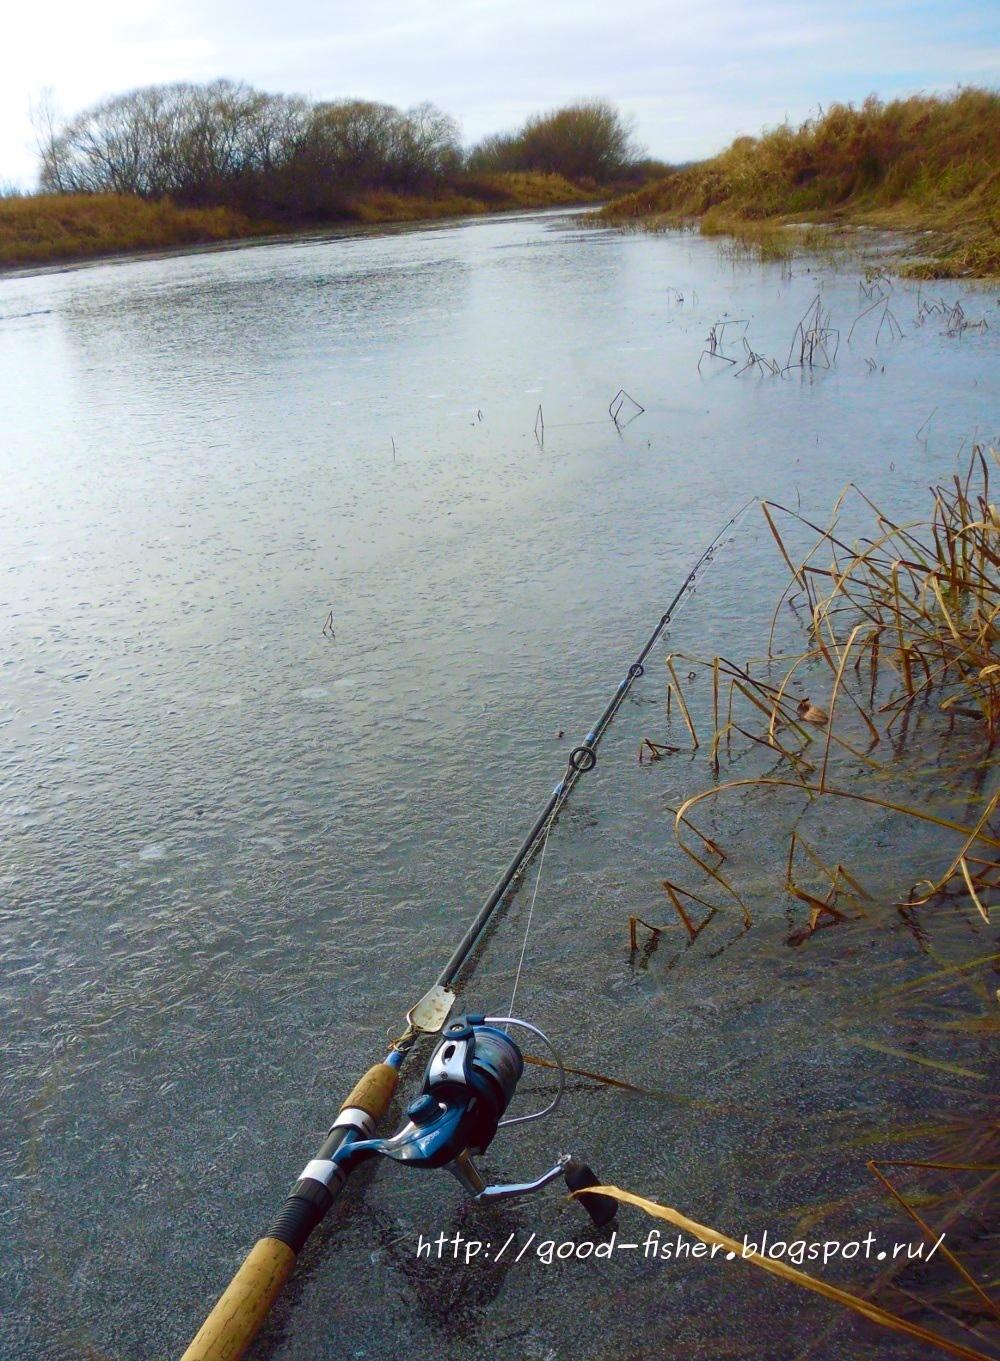 Рыбалка. Рыбалка в октябре